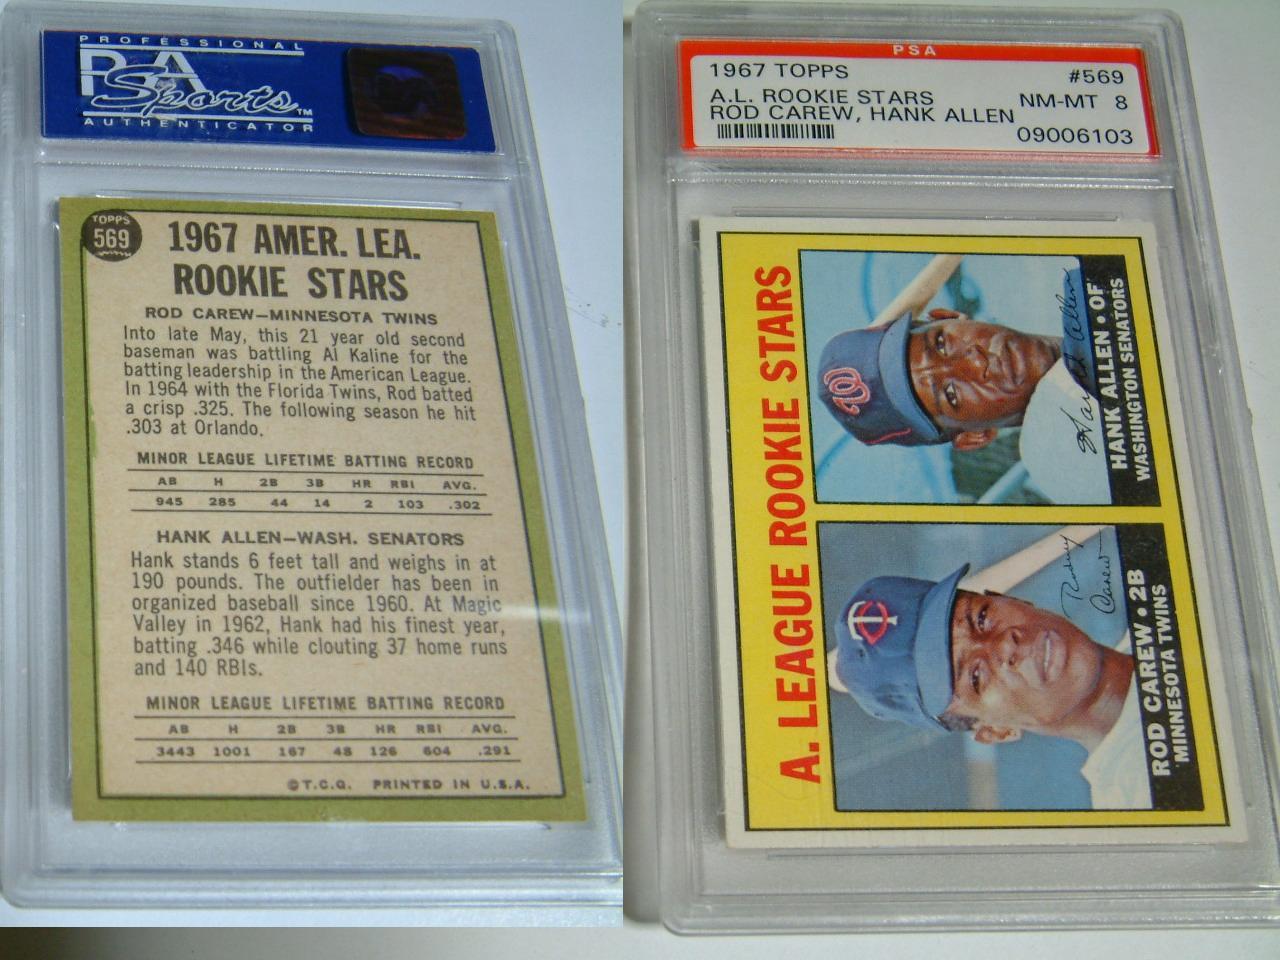 1967 TOPPS ROD CAREW #569 Rookie cardPSA 8 NM-MT 証明付